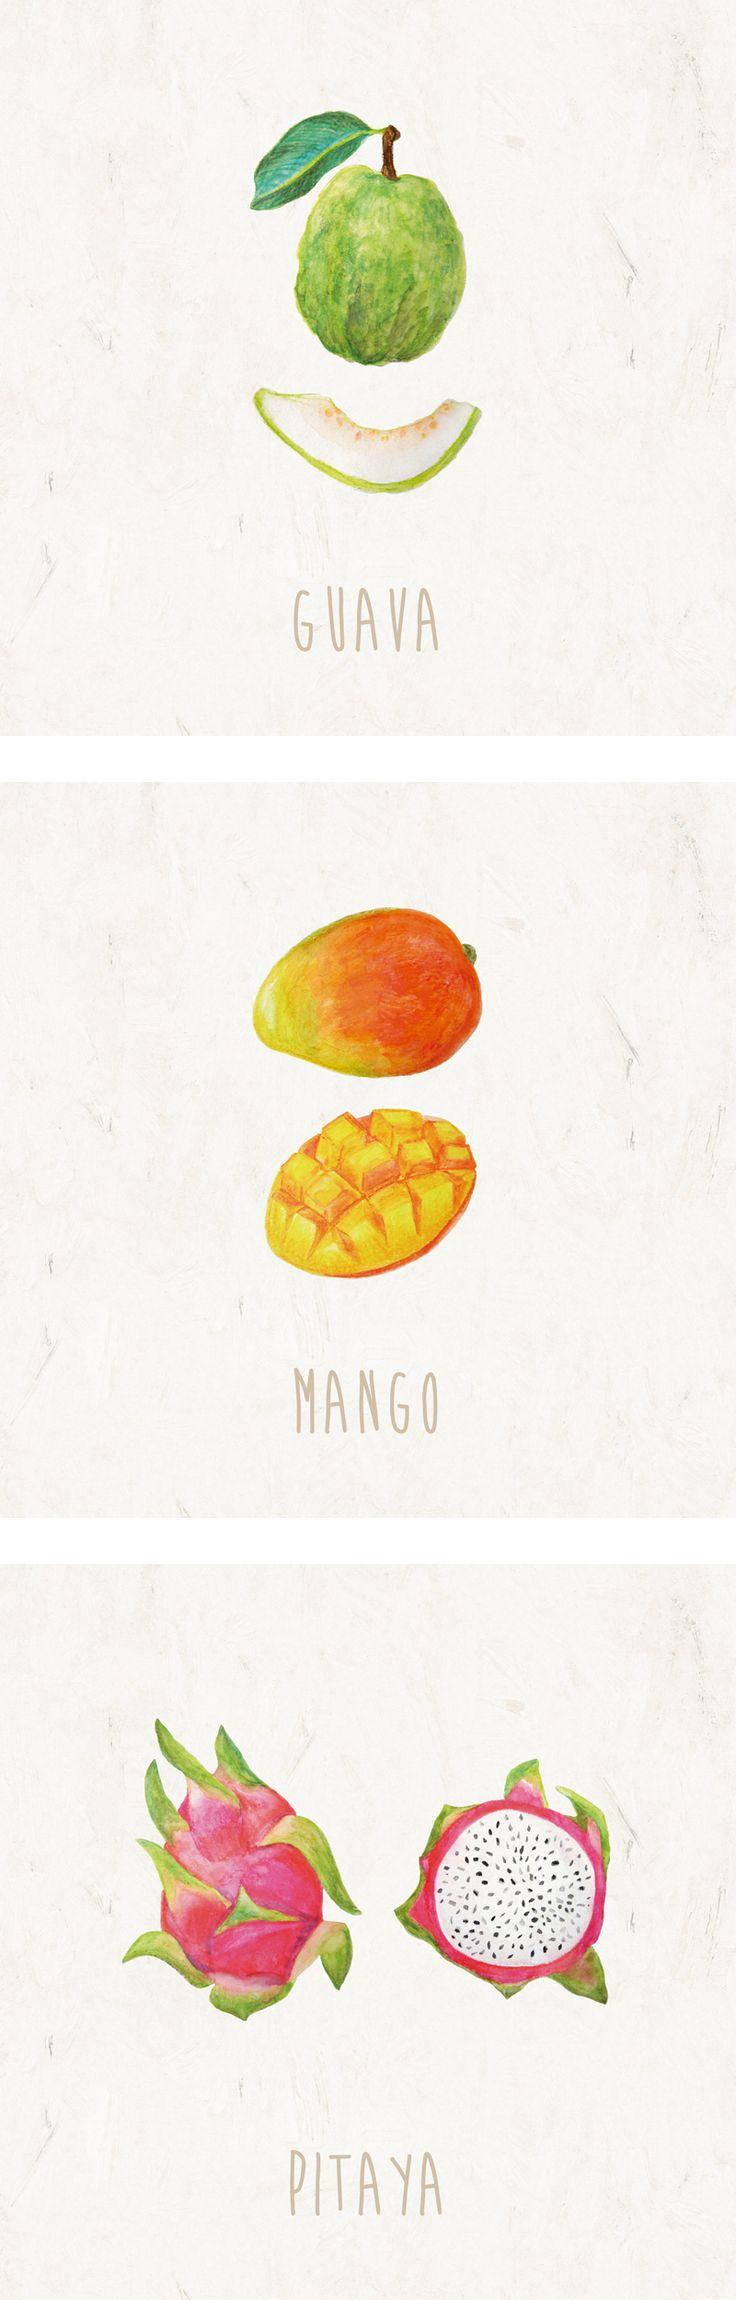 fruits illustration http://oupt.tumblr.com/post/90374439990